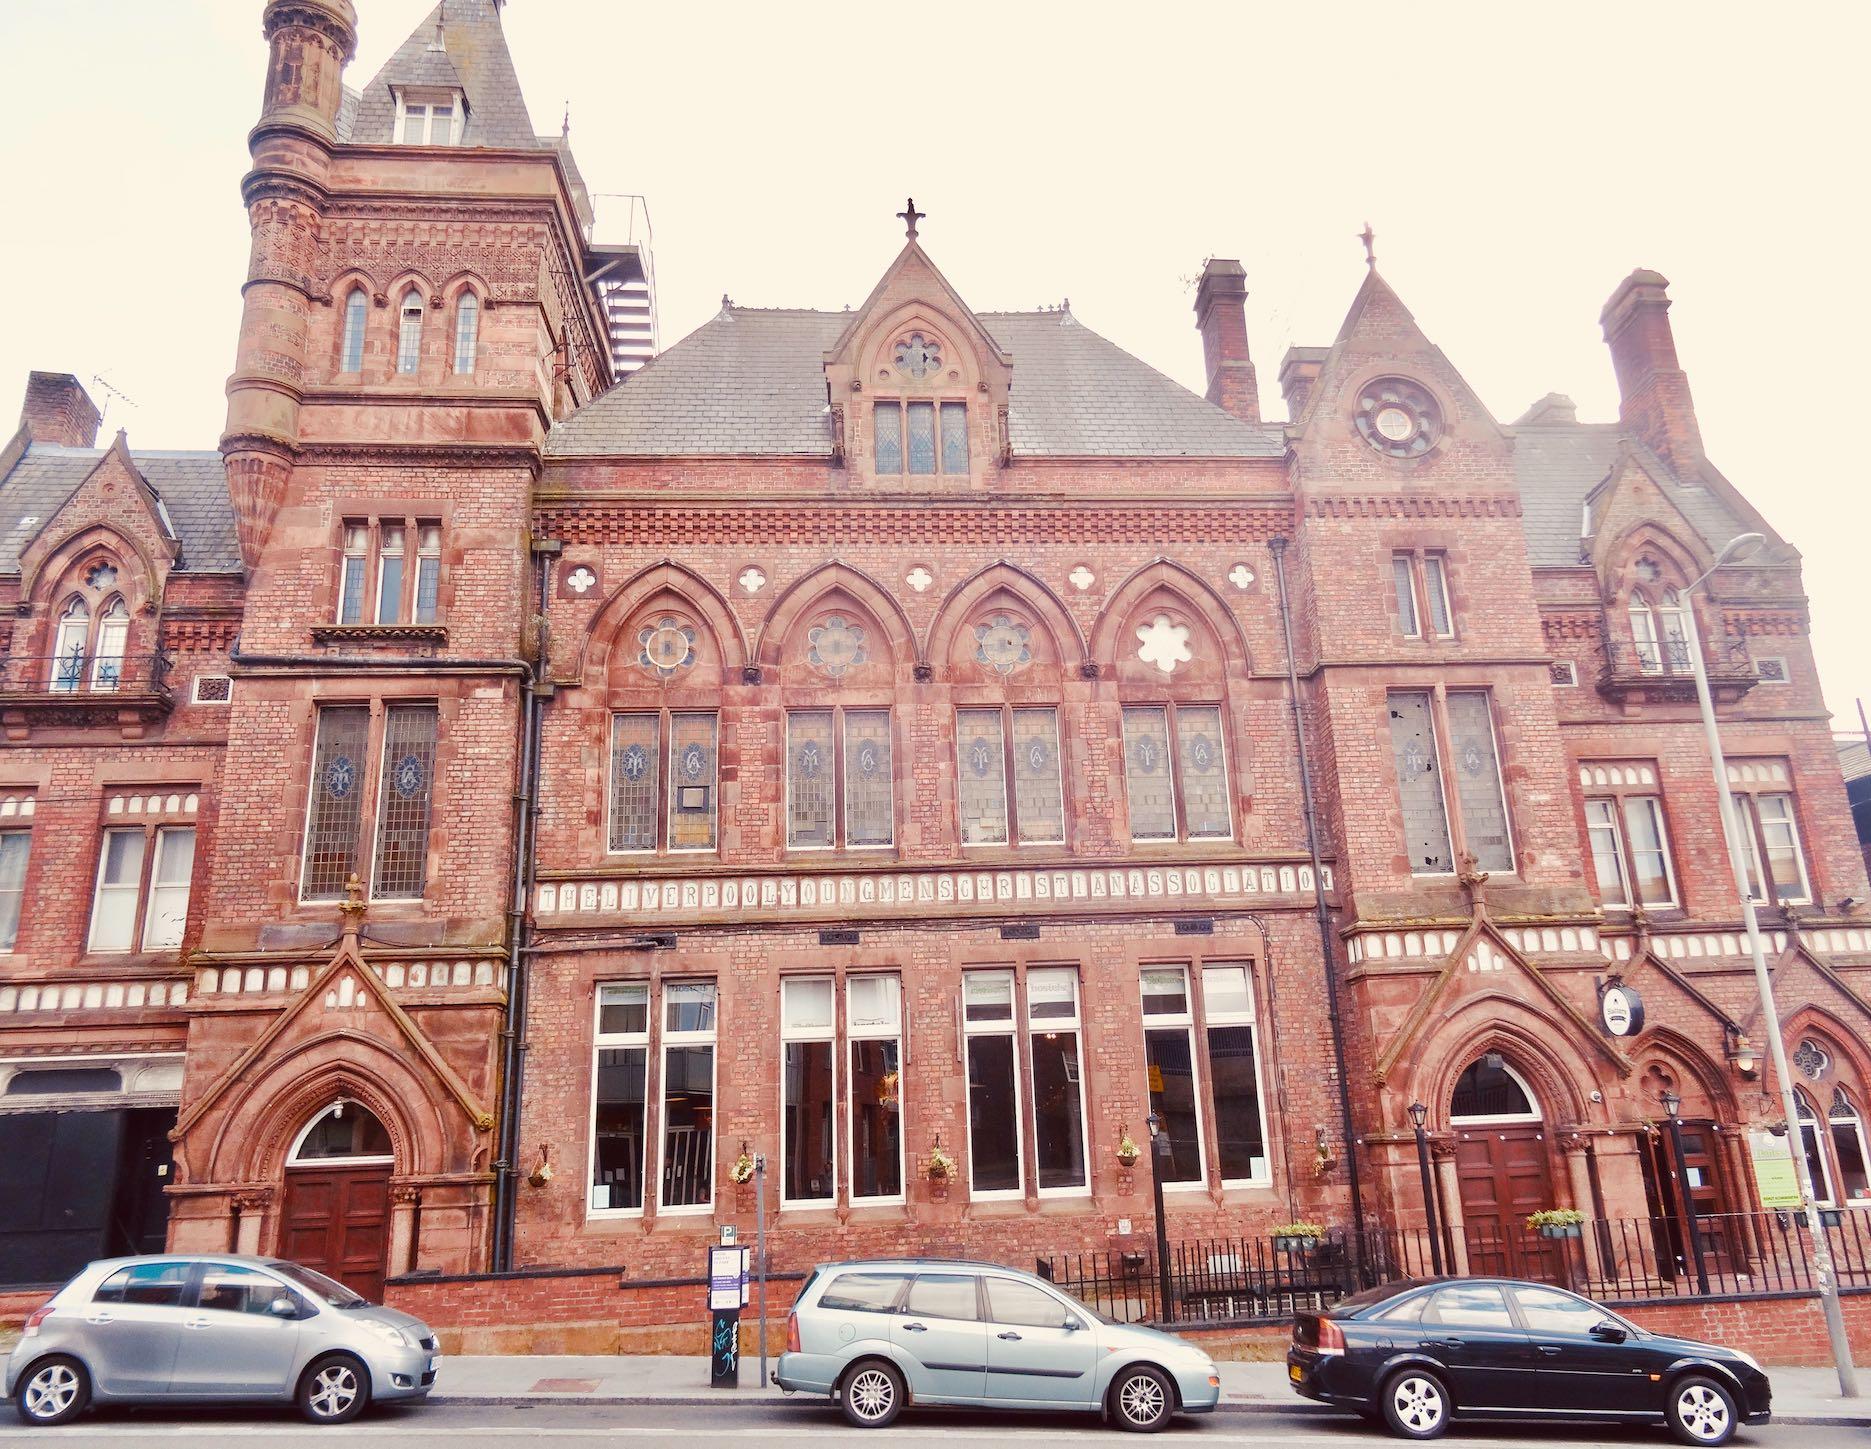 Hatters Hostel in Liverpool.